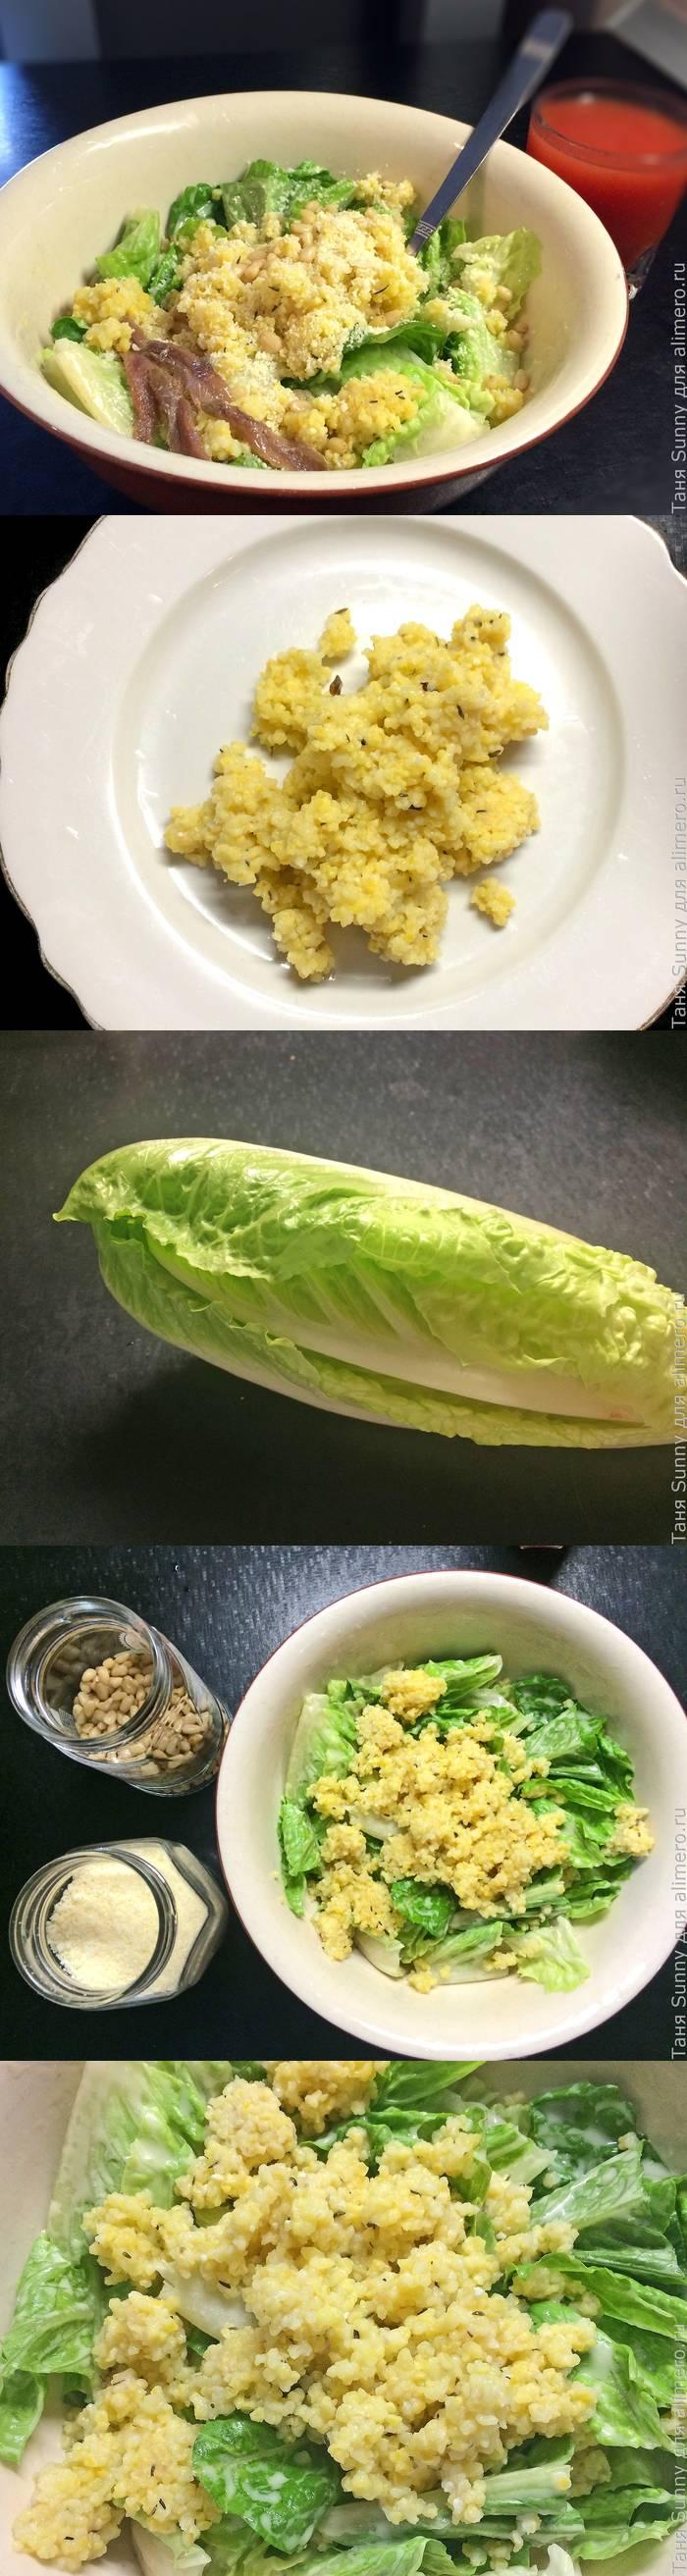 Зелёный салат на обед